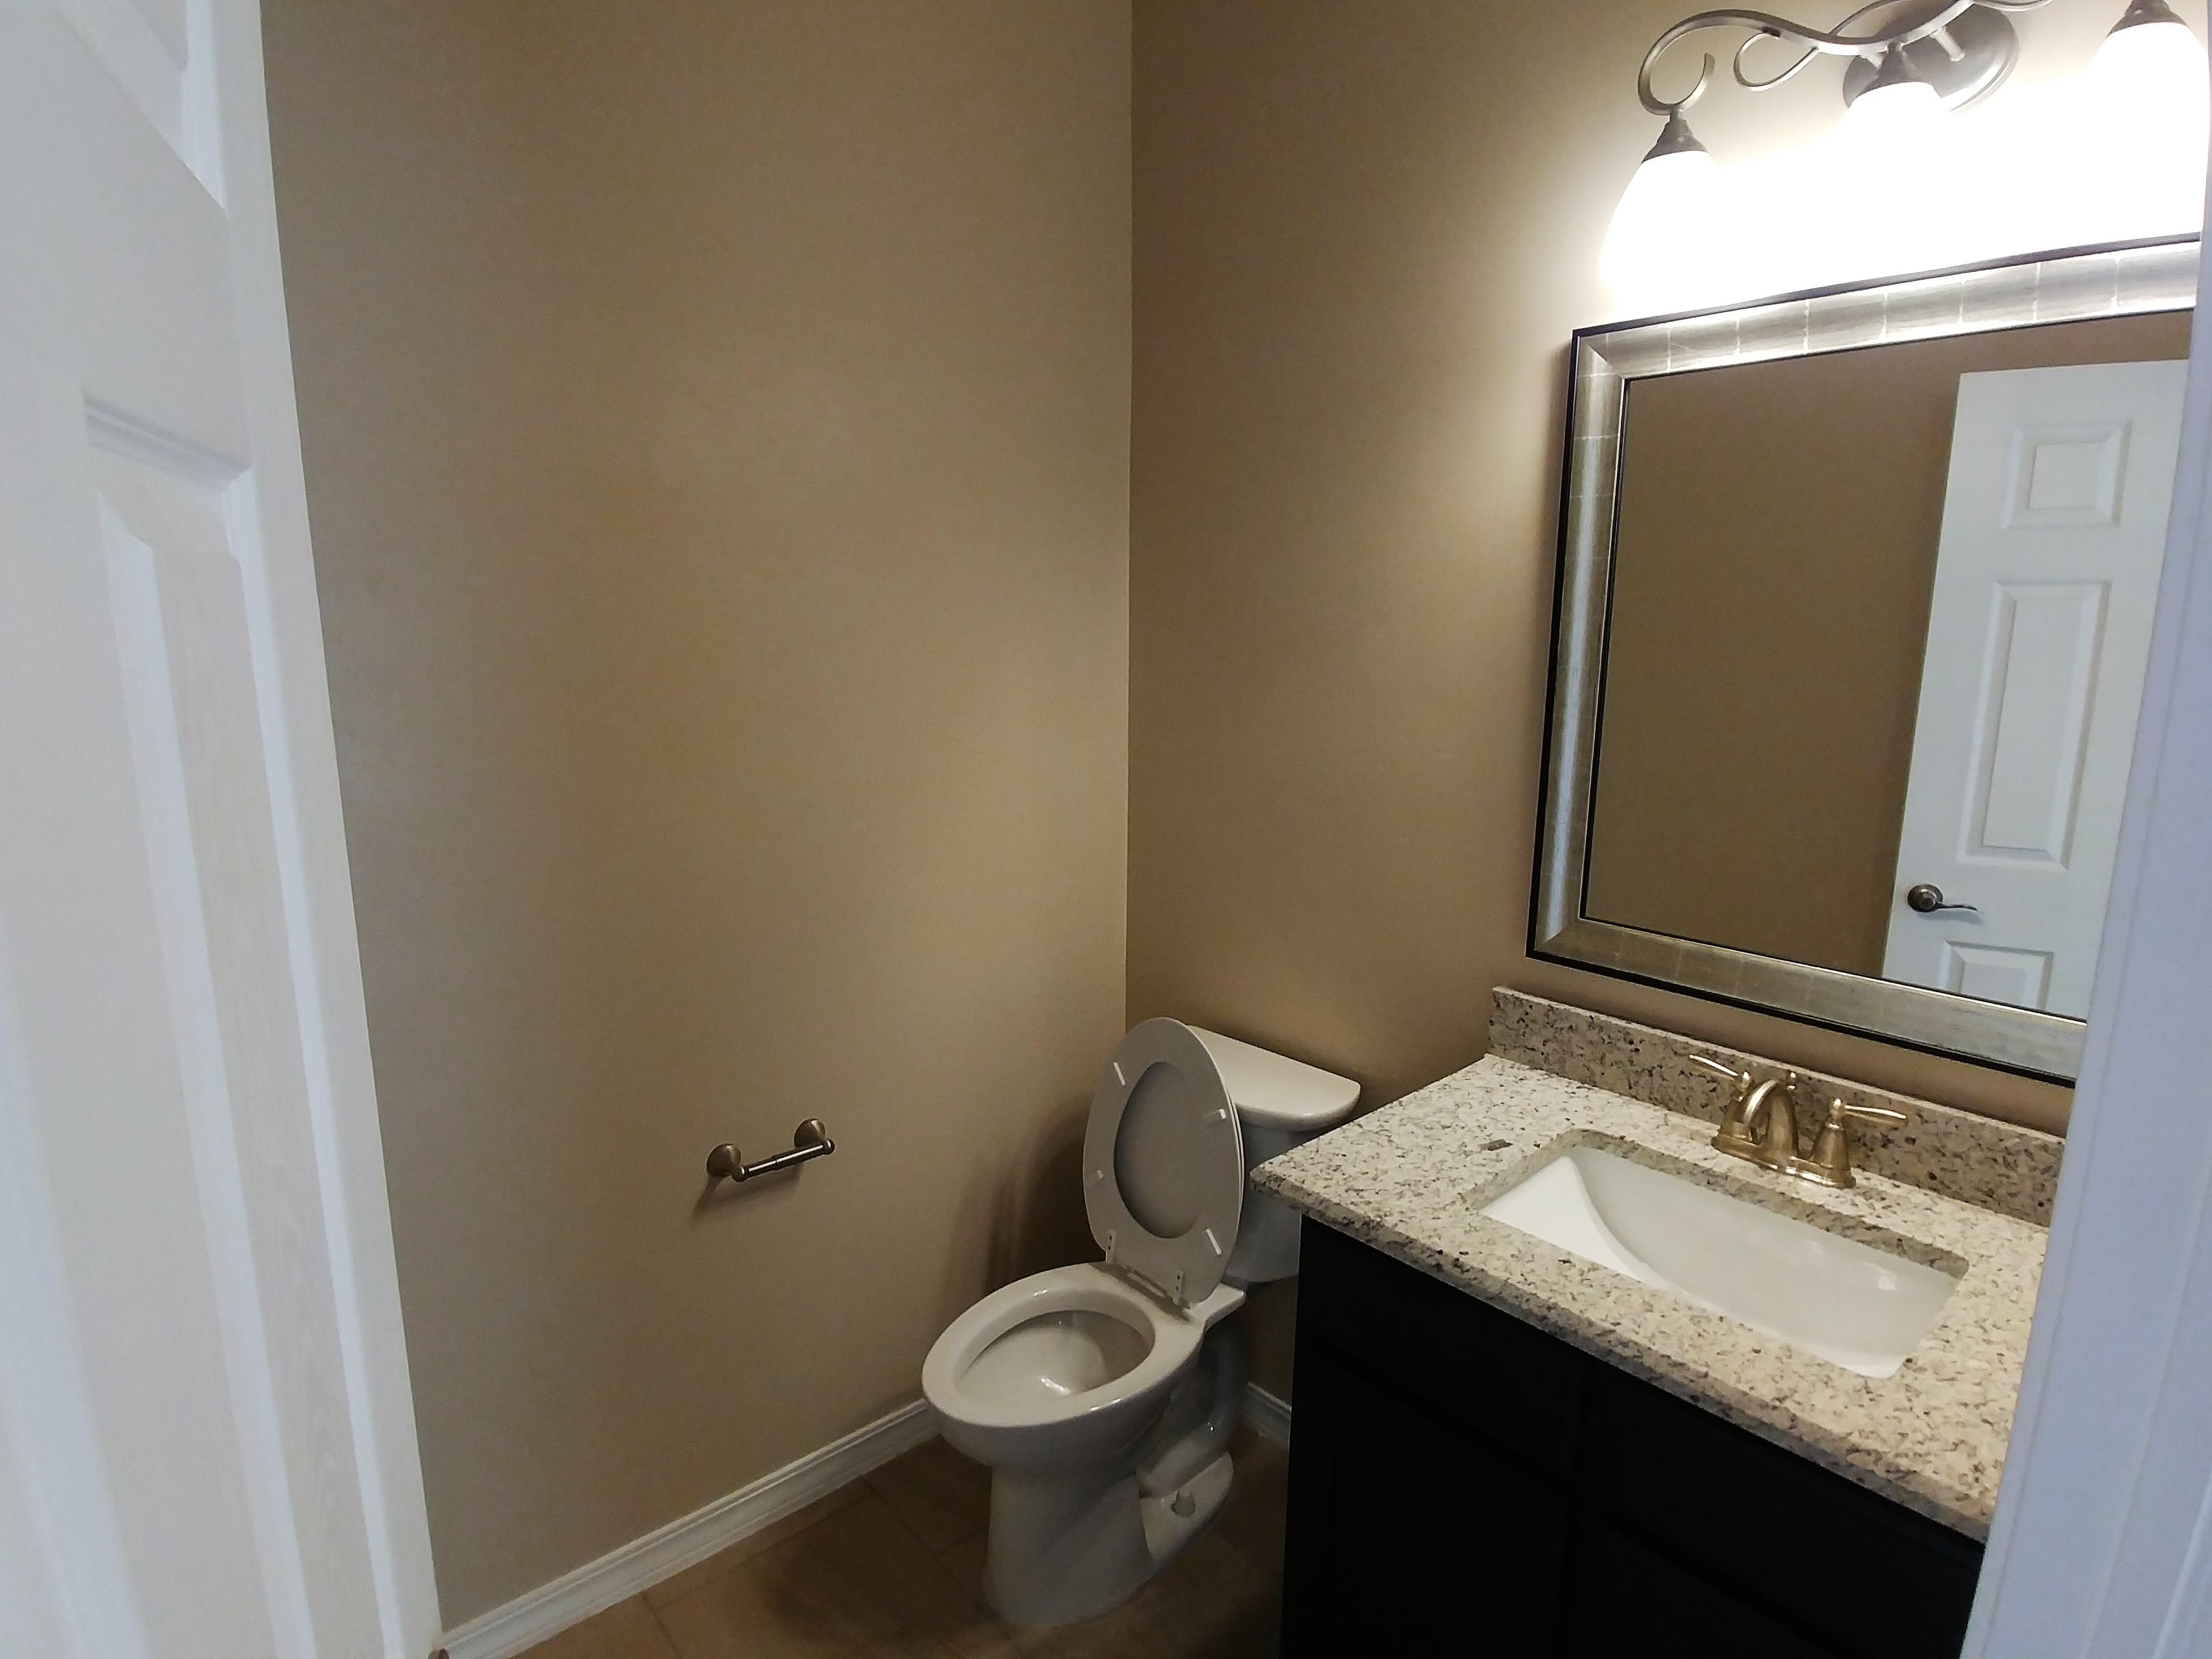 2050 Floor Plan - Hall Bath